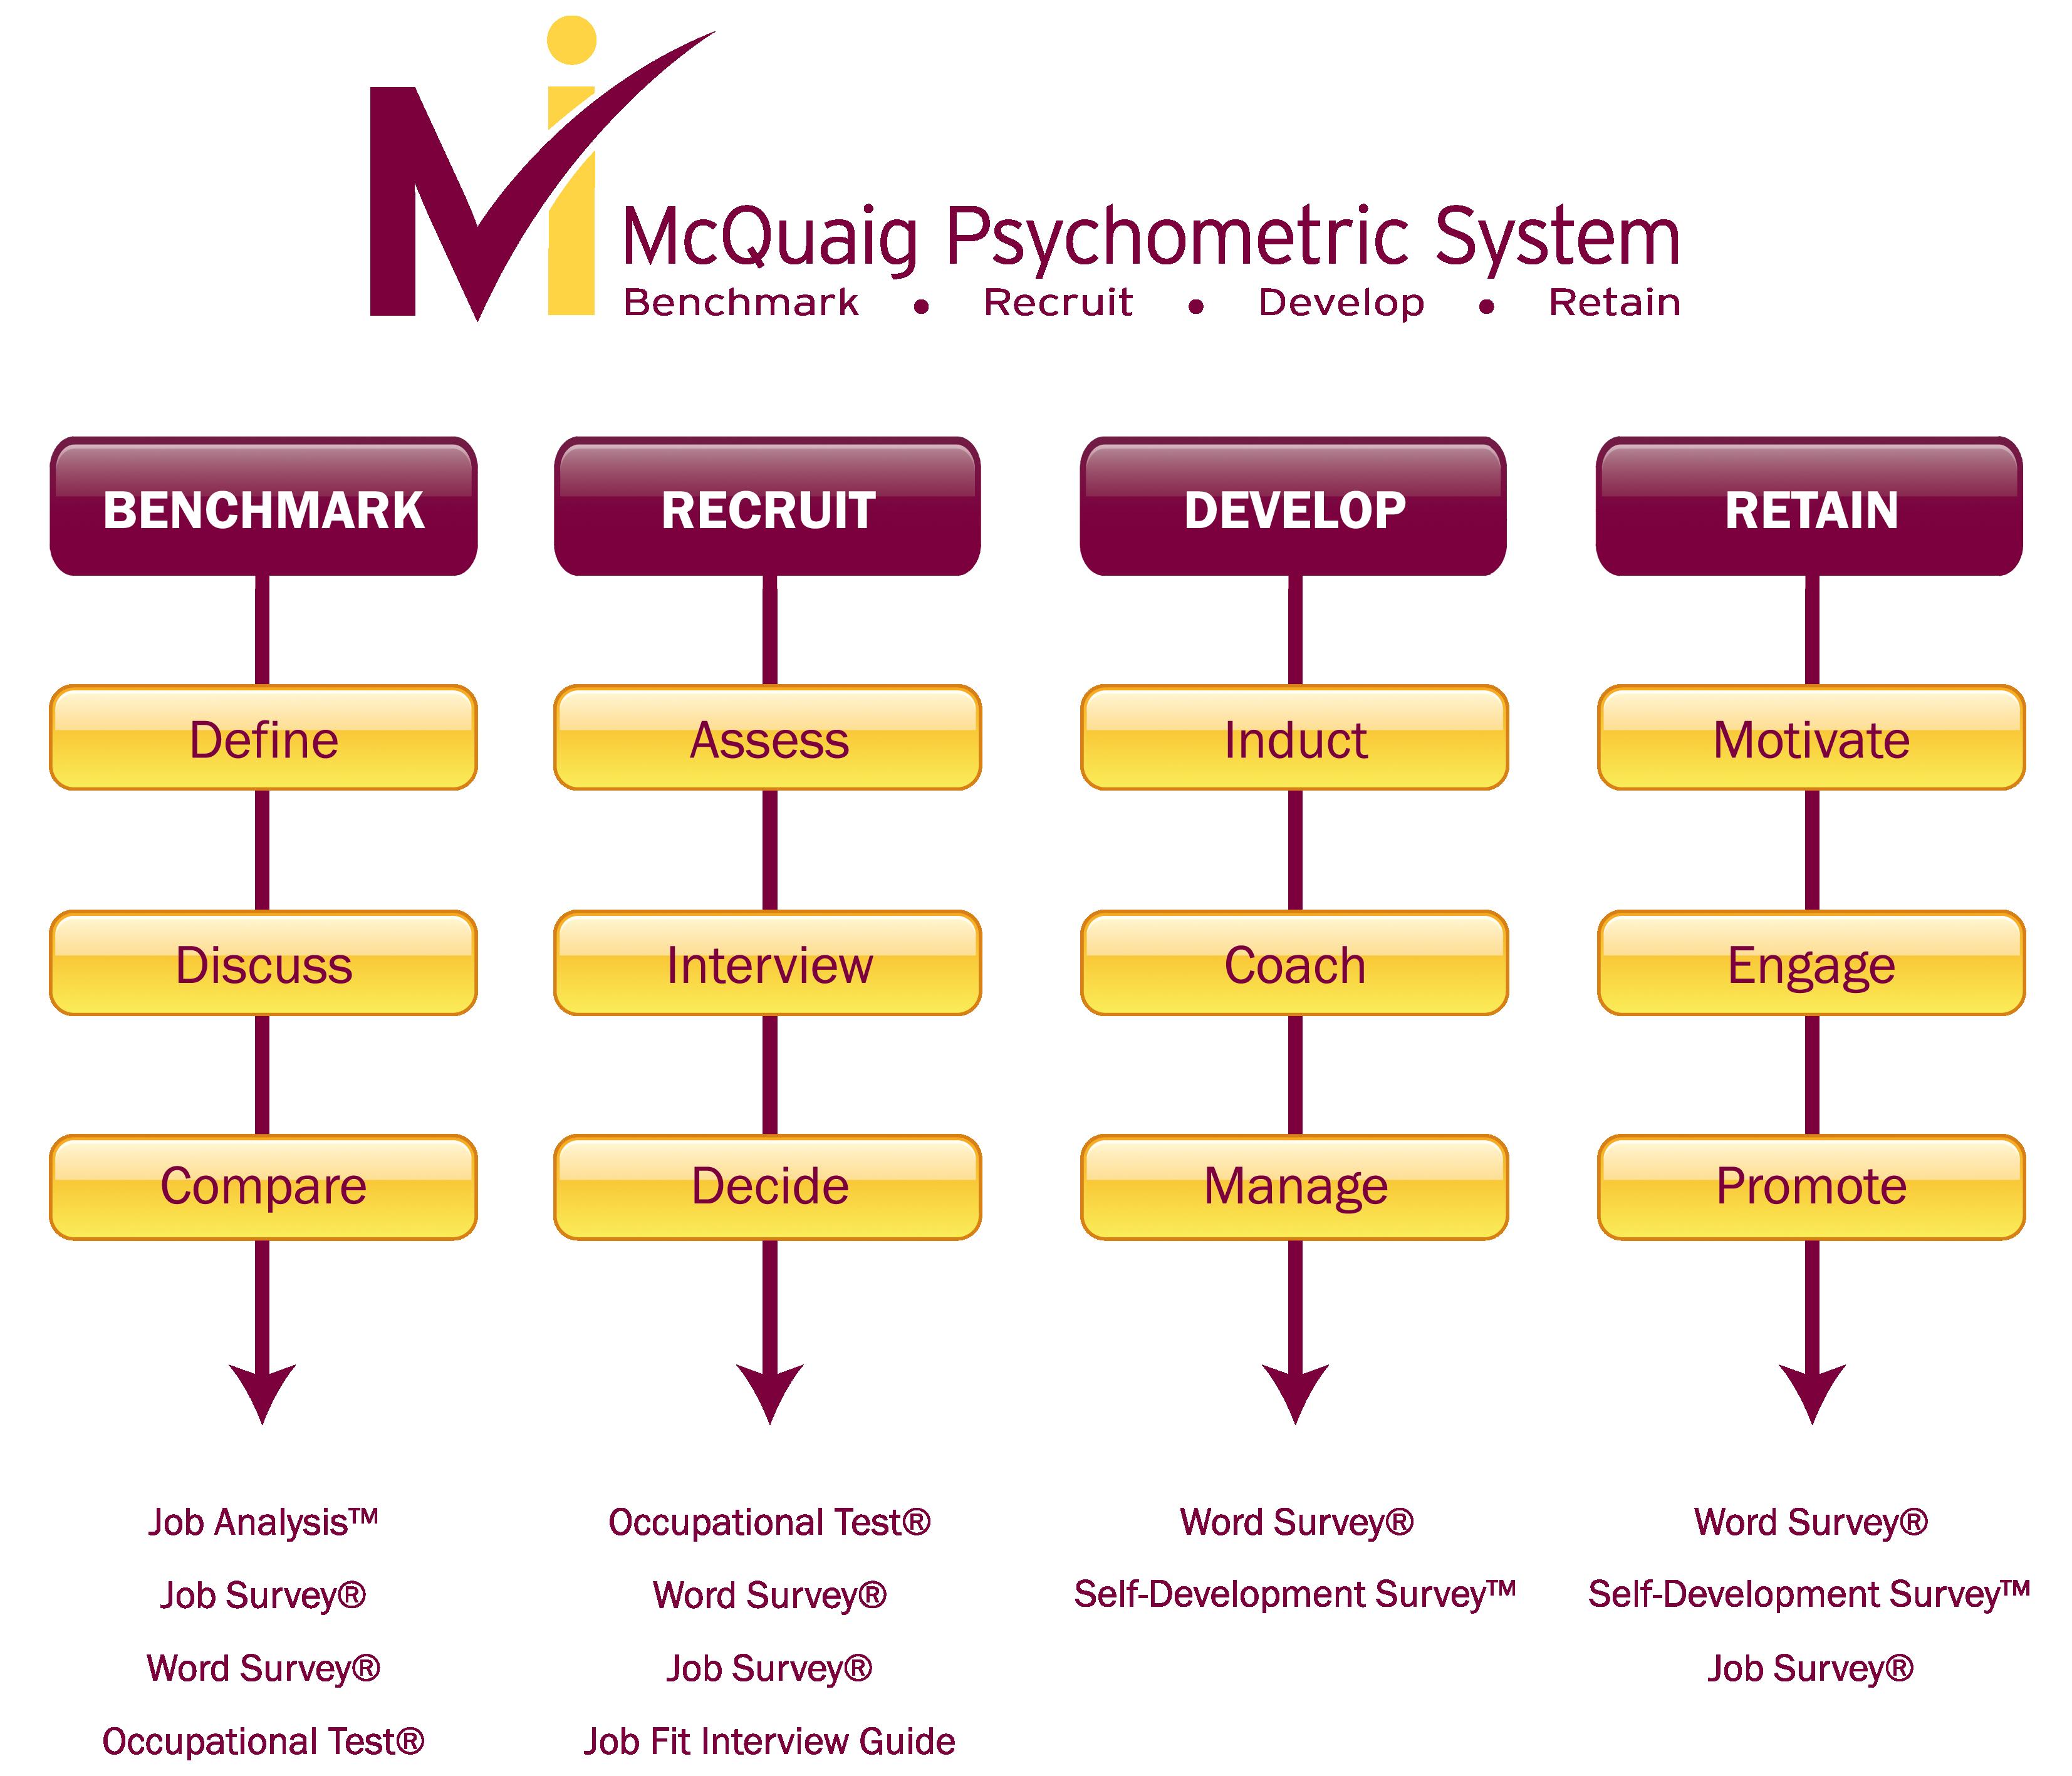 The McQuaig Psychometric System